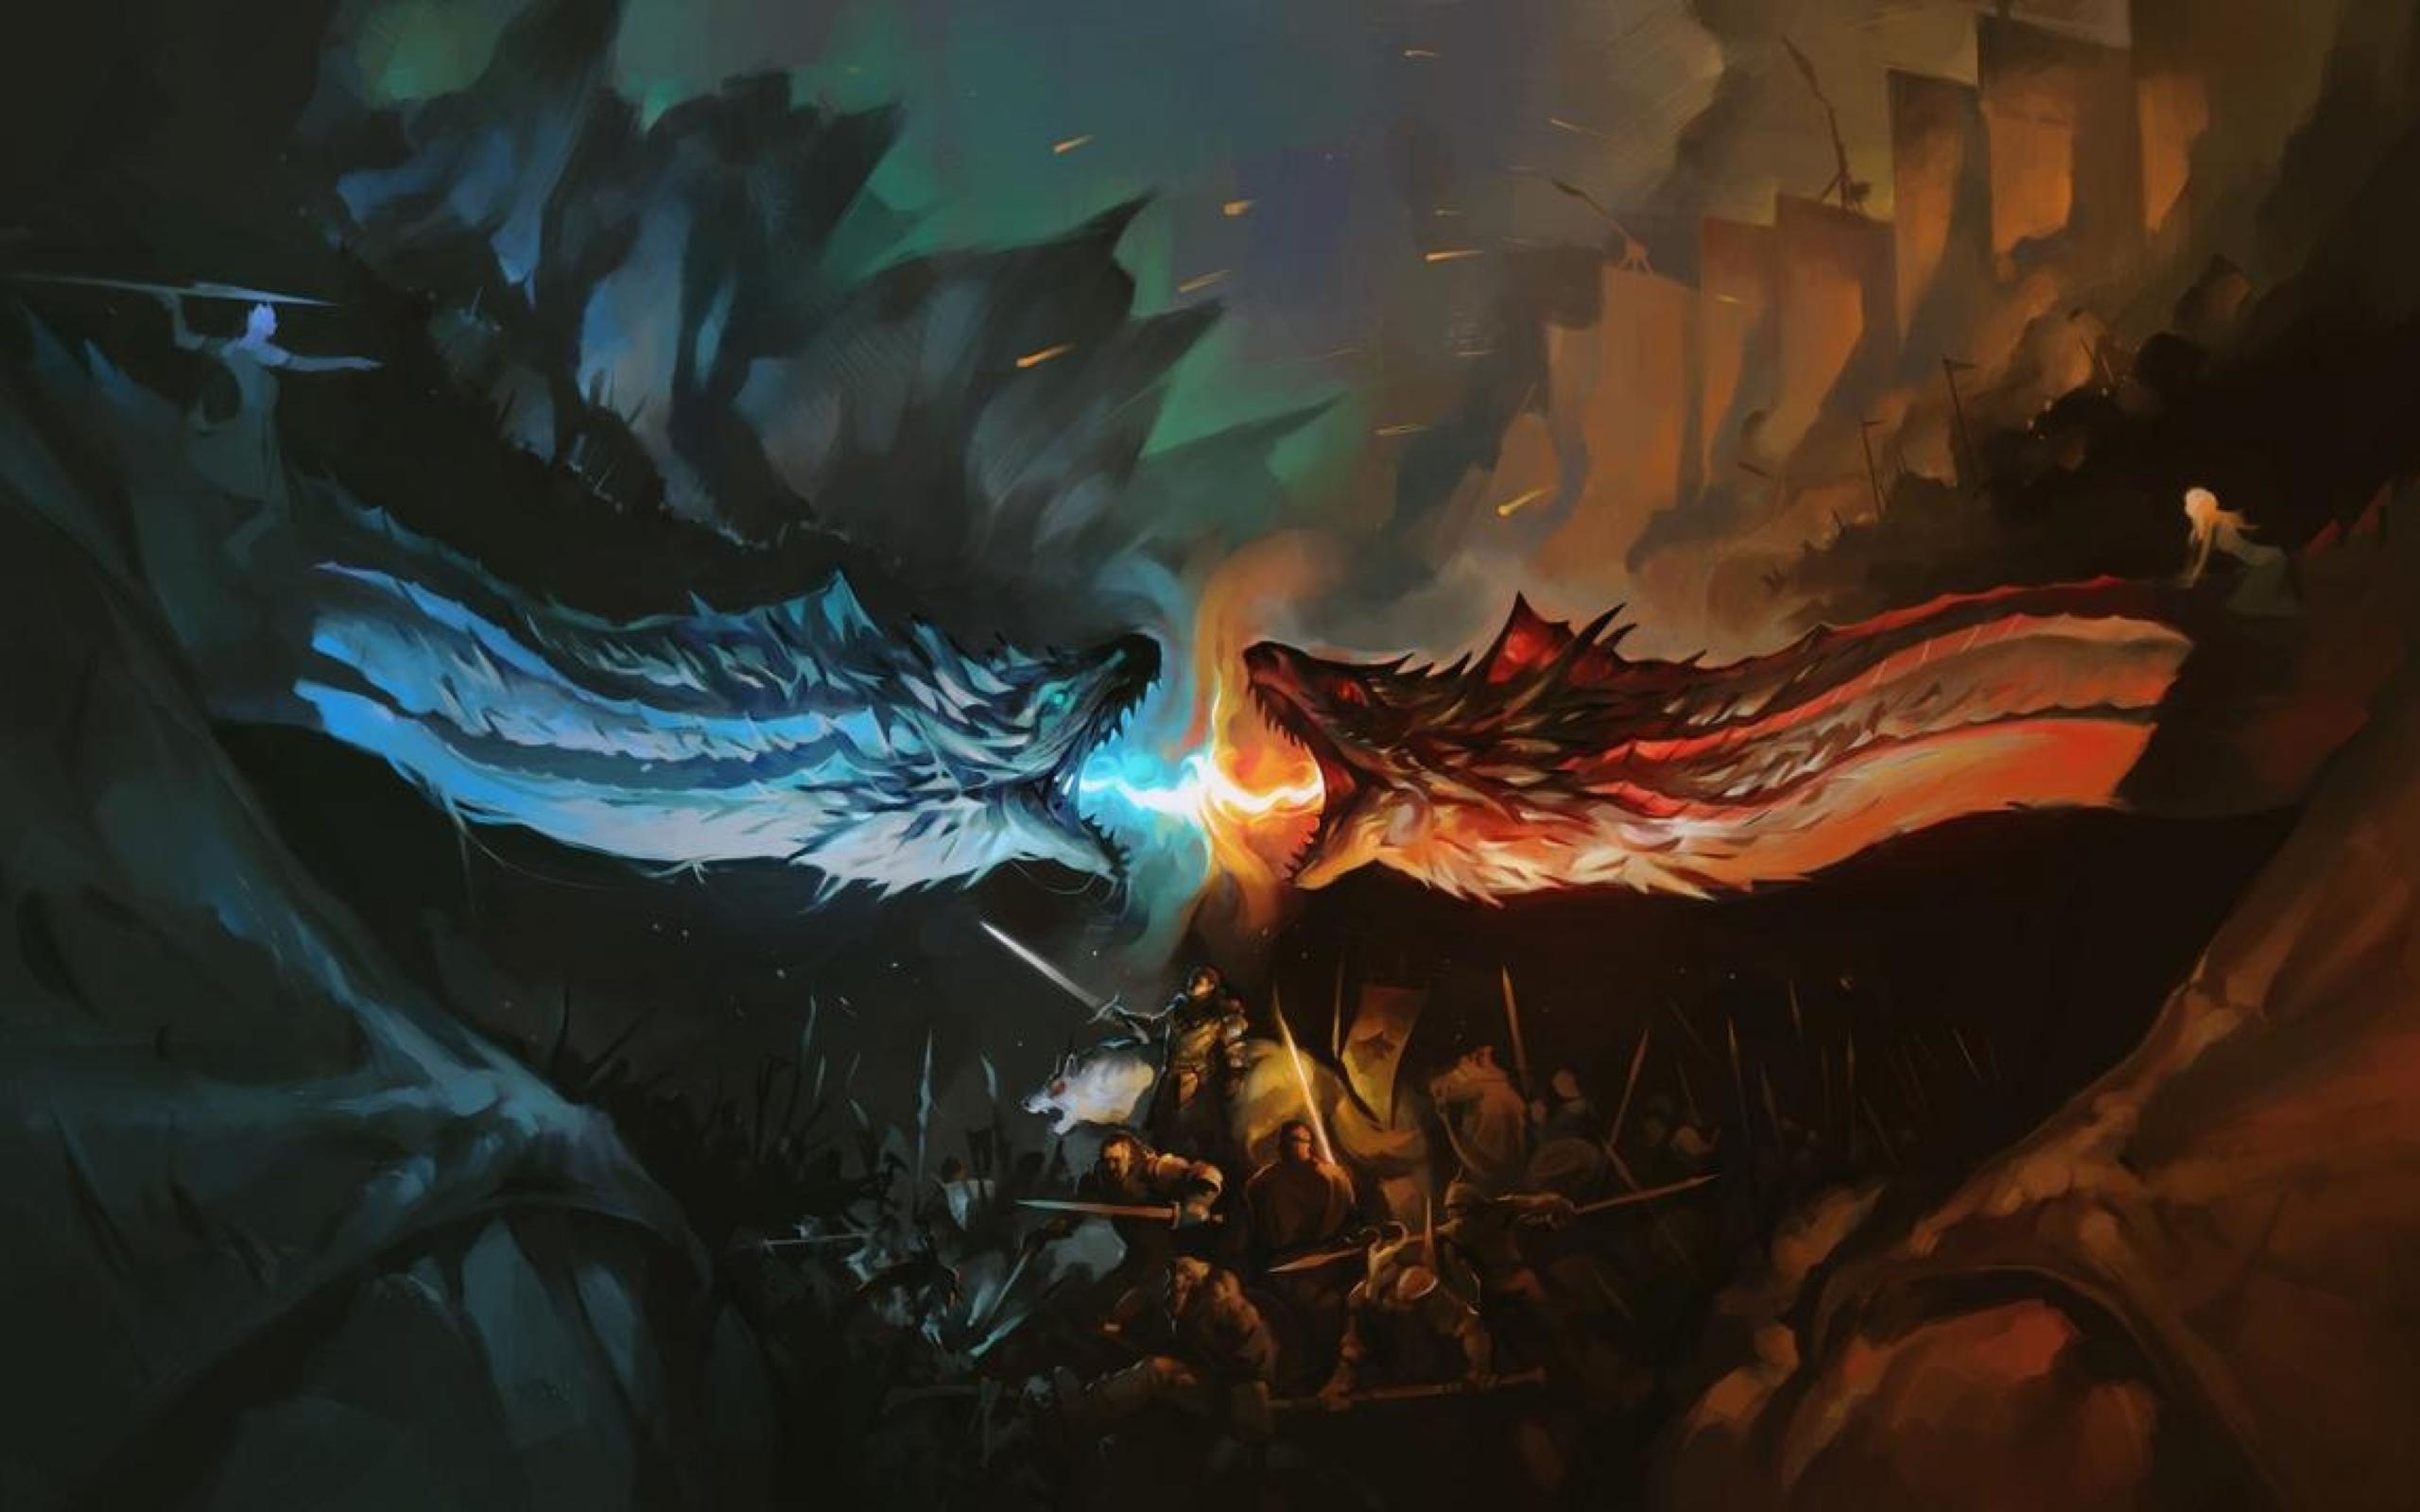 Dragon Battle Fire Vs Ice Game Of Thrones, HD Wallpaper